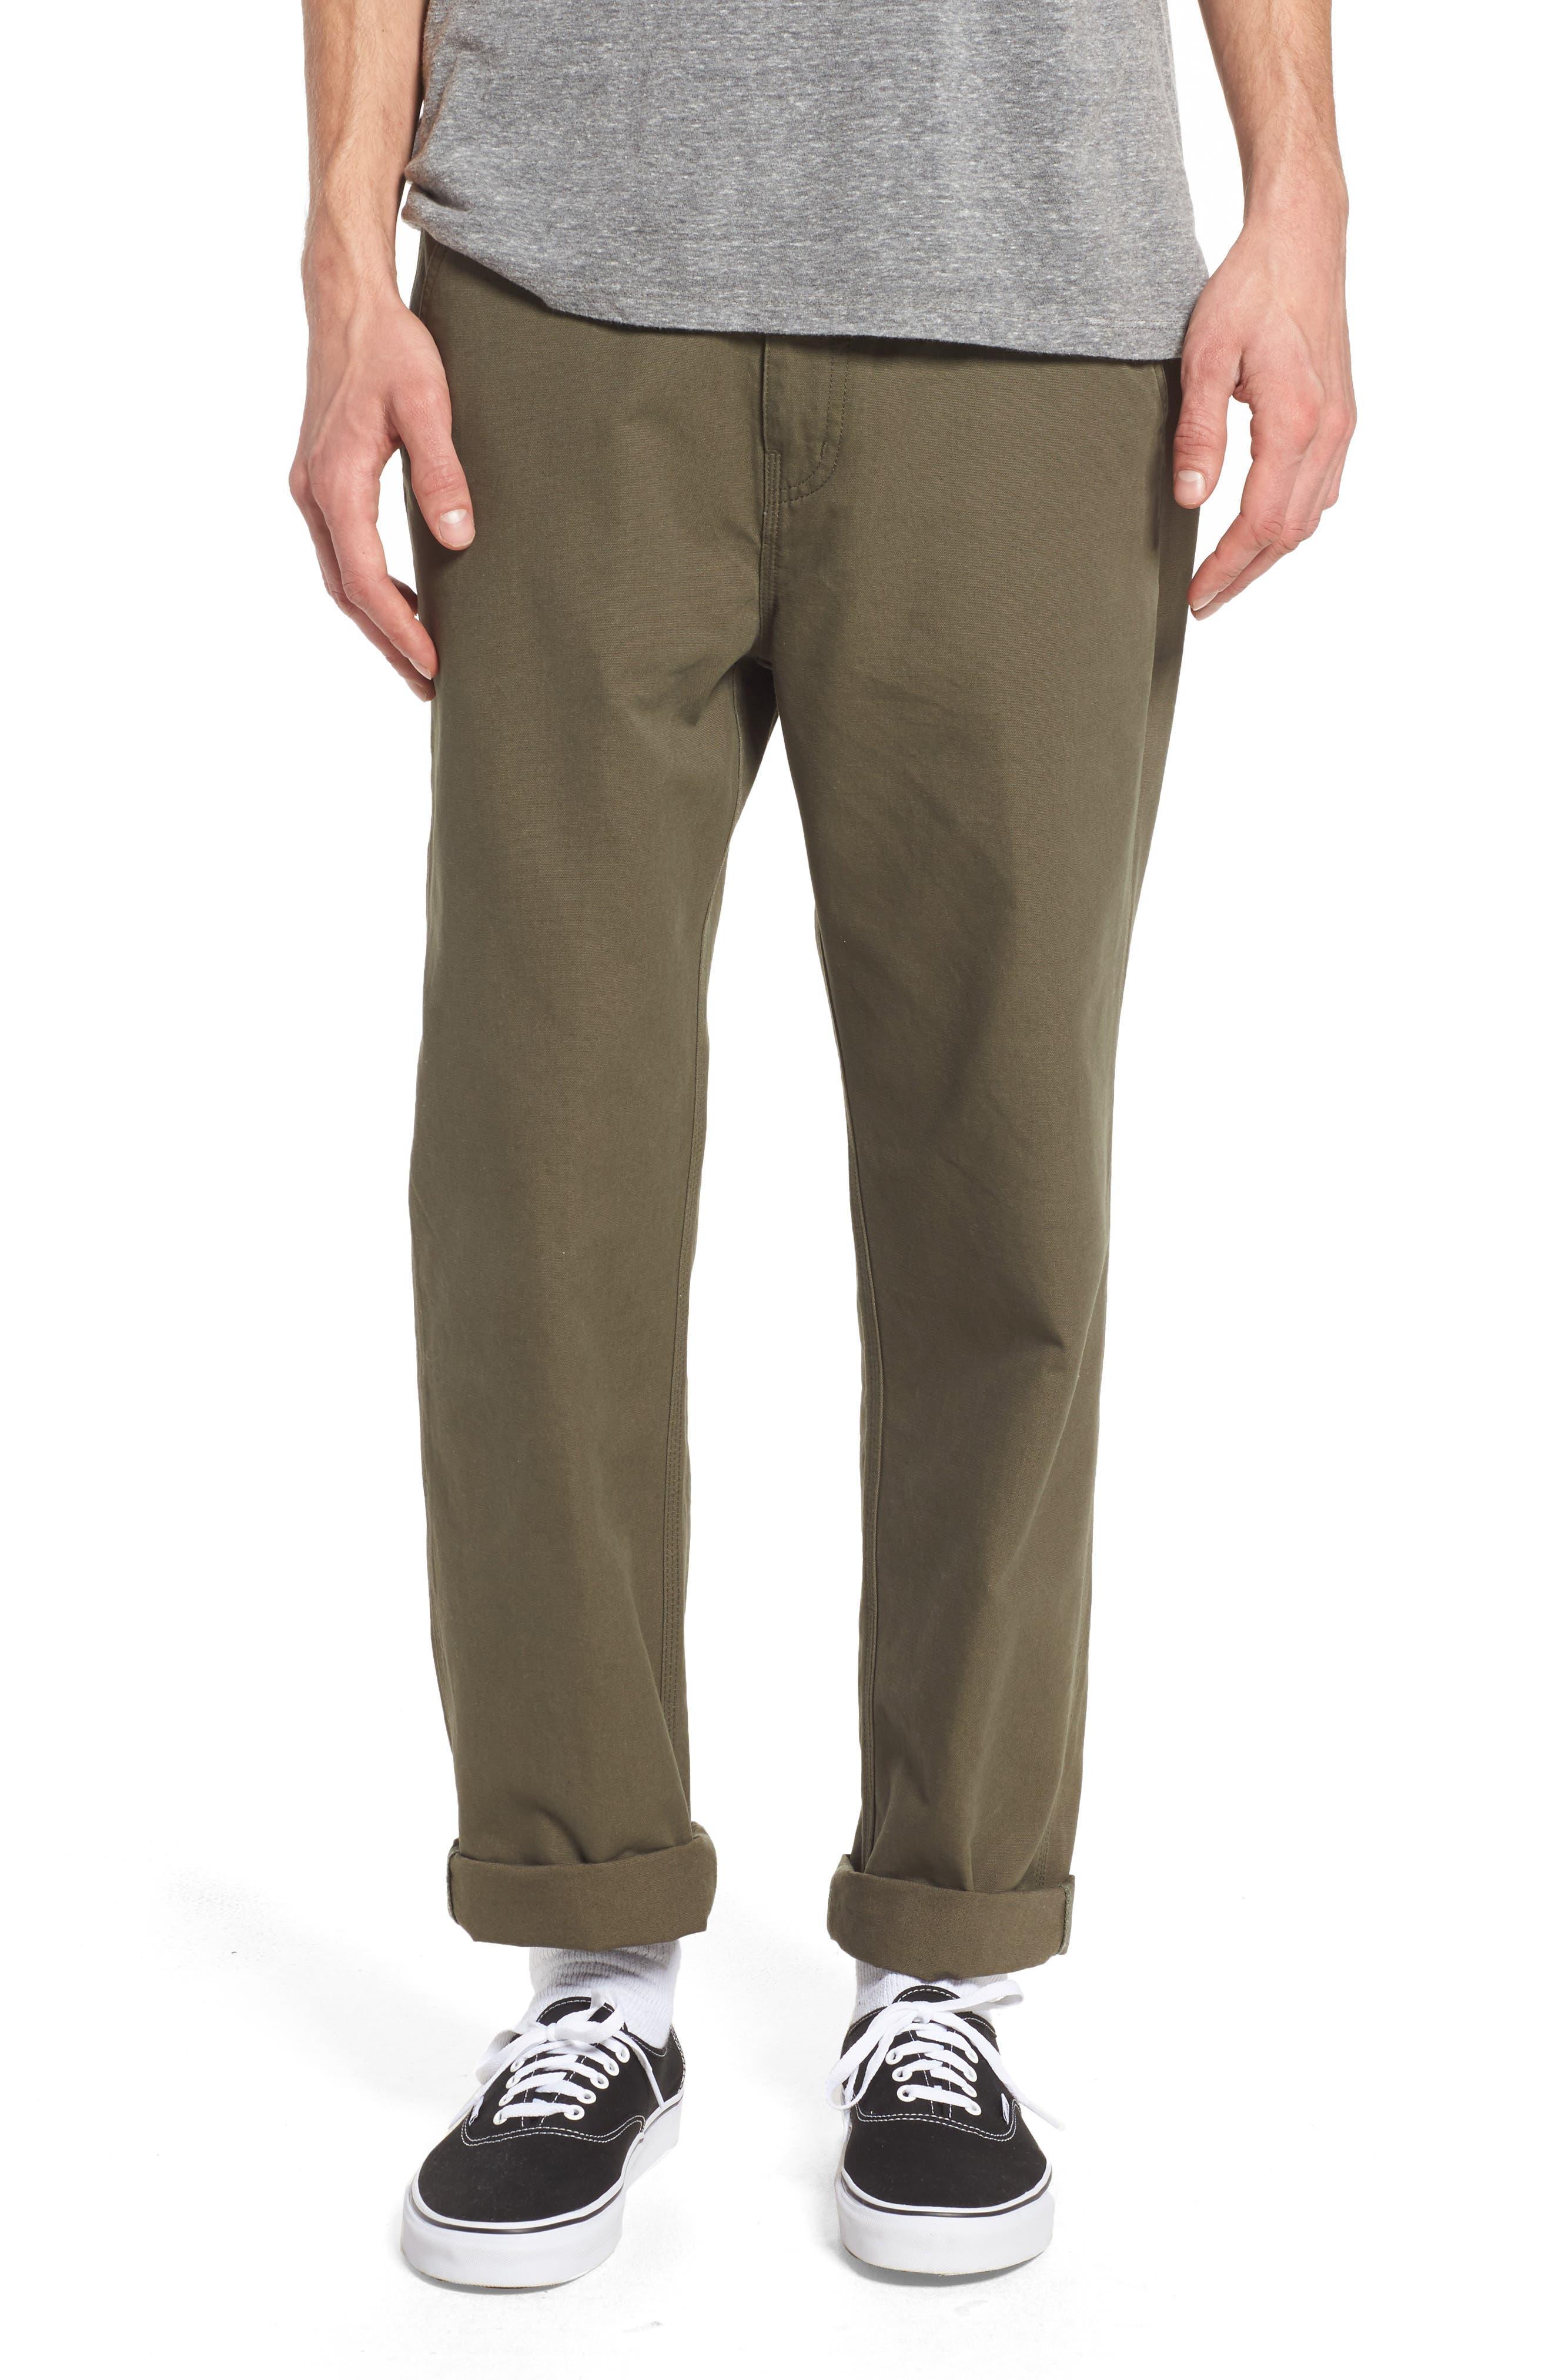 Westport Utility Pants,                             Main thumbnail 1, color,                             Olive